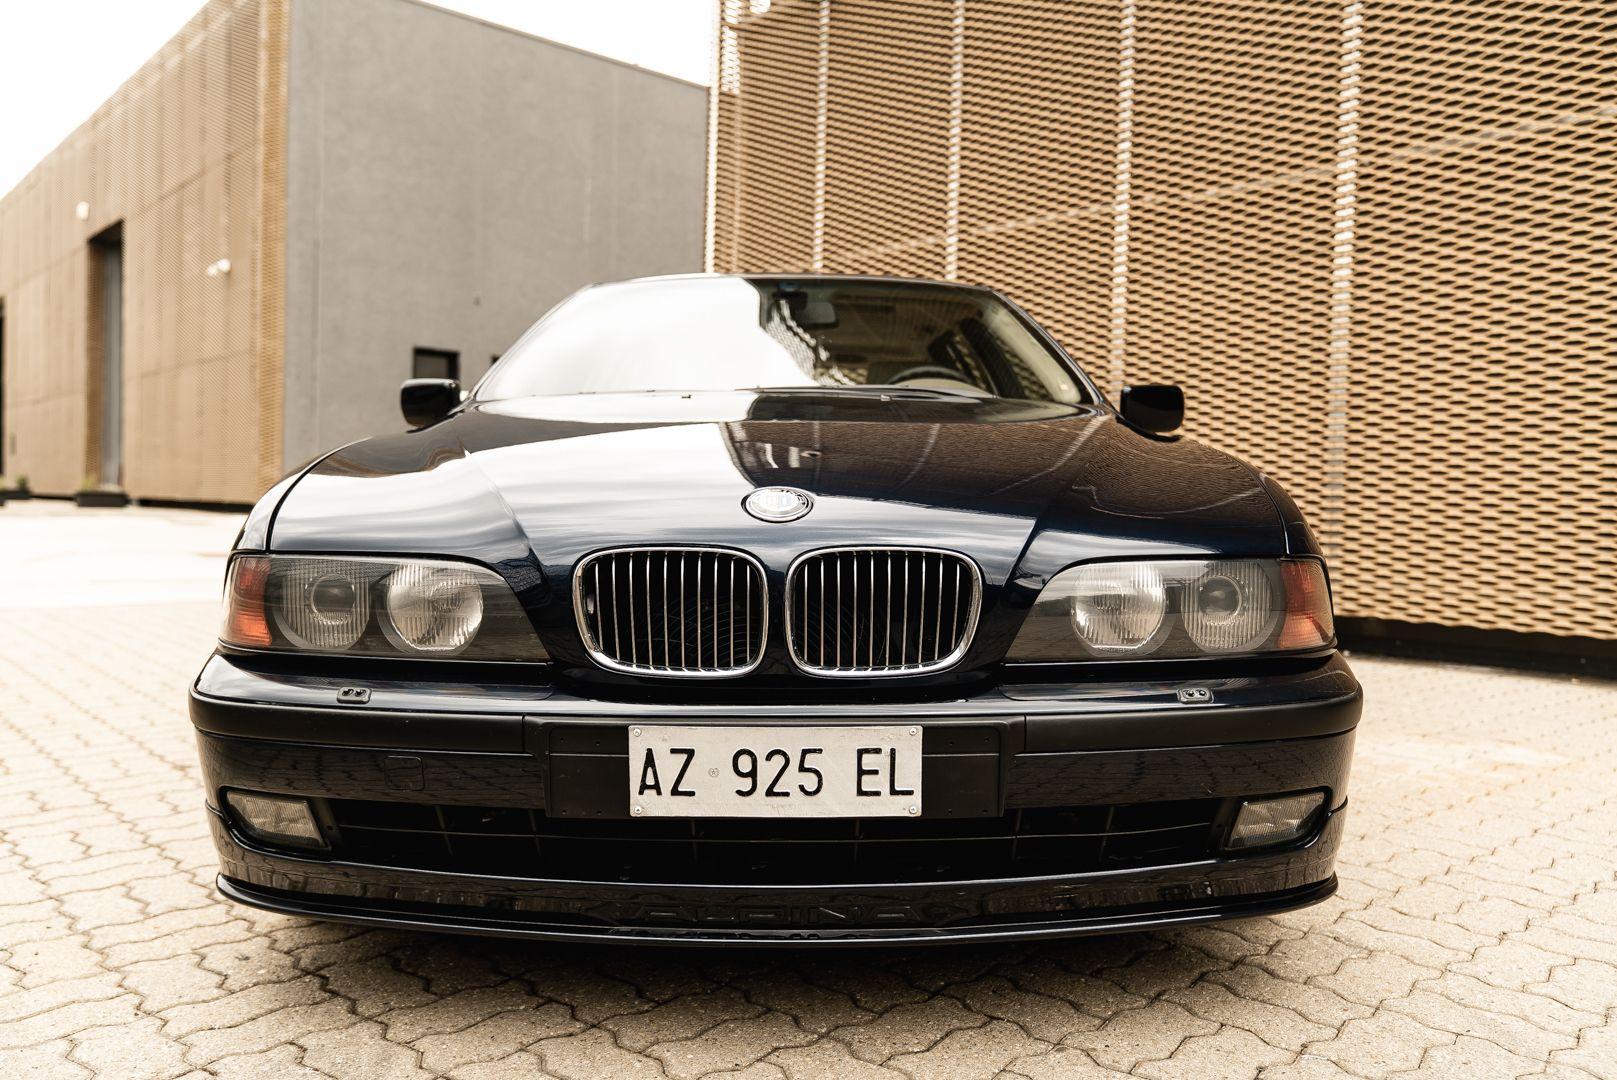 1998 BMW Alpina B10 Touring V8 82/204 78171